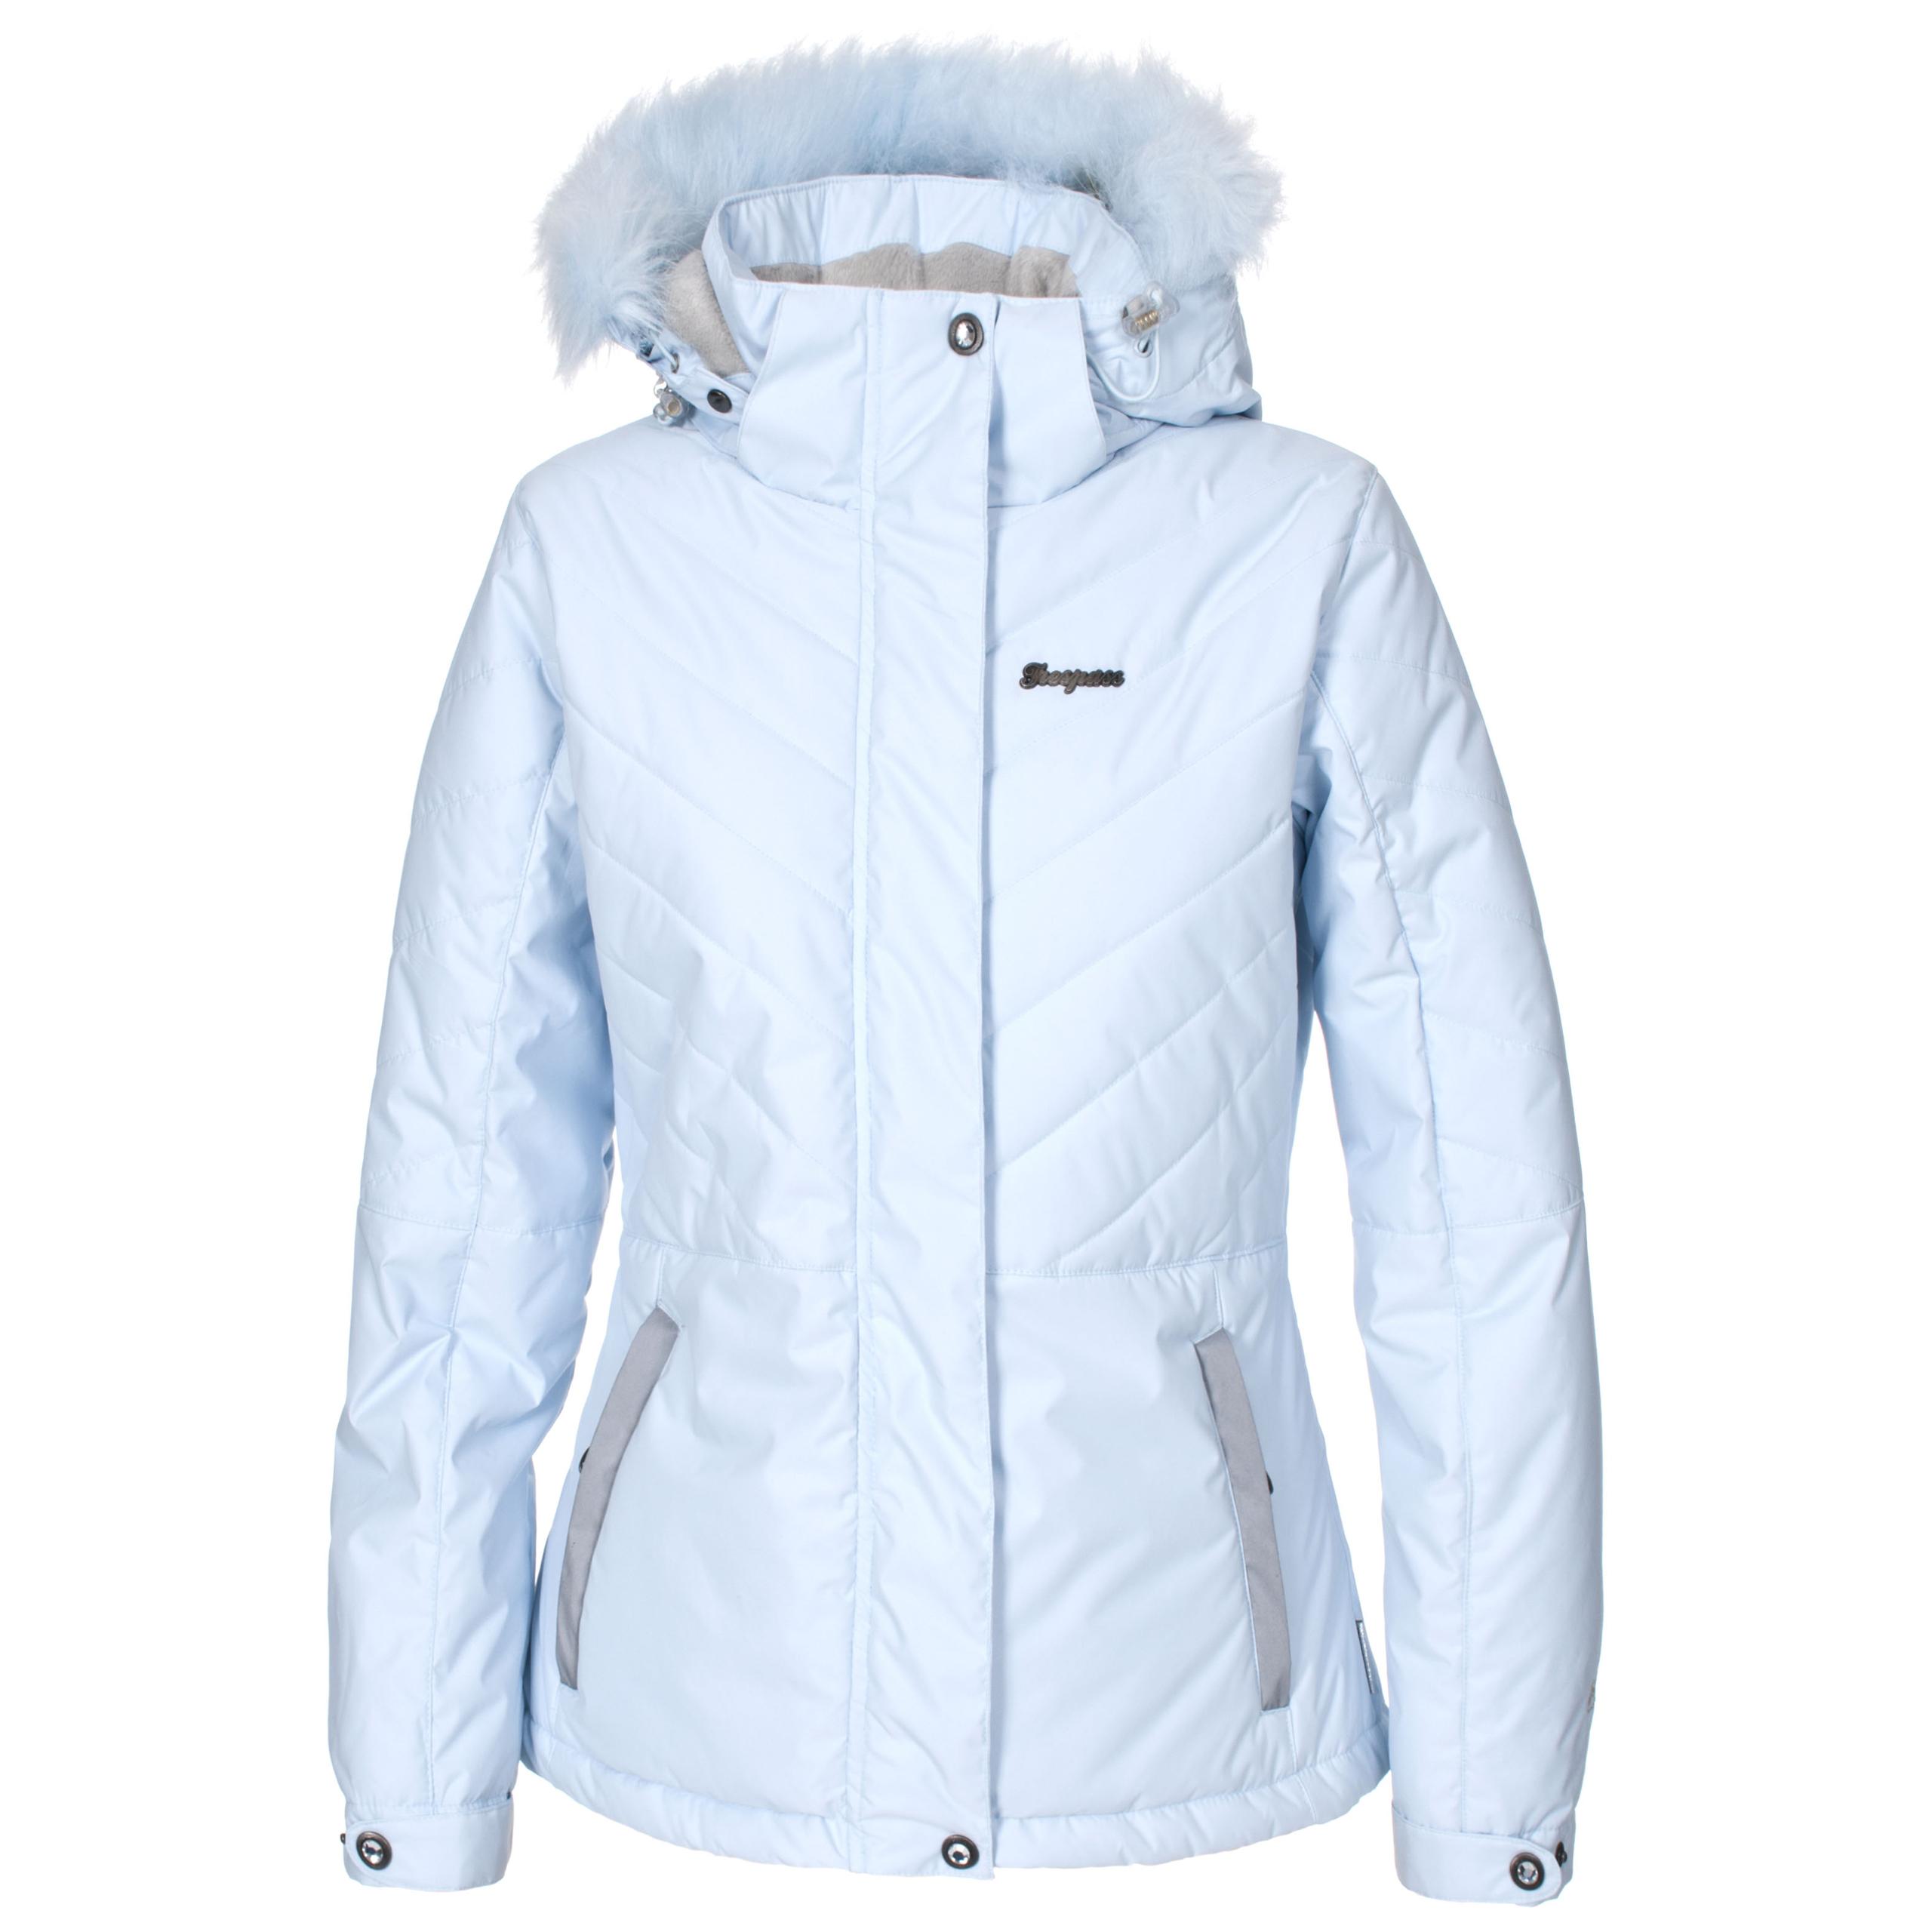 Womens ski jacket with fur hood